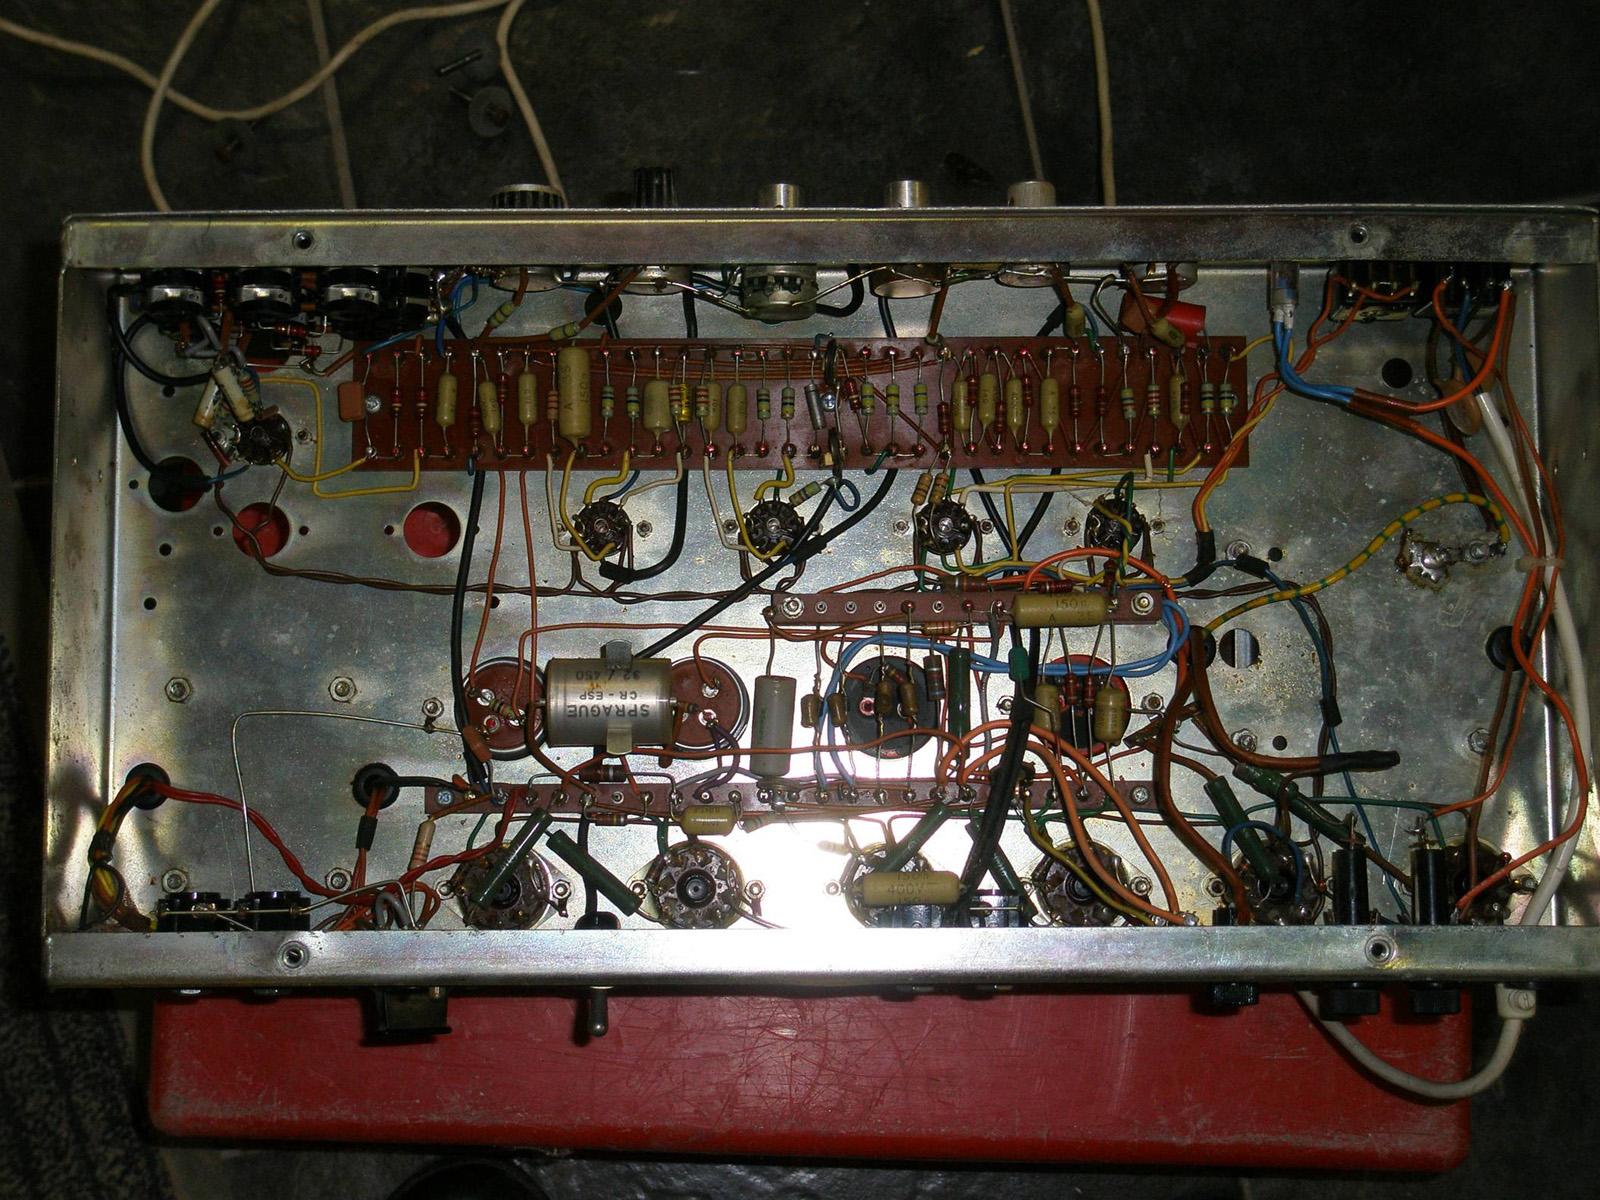 2x30w El34 Tube Amplifier Kaizer Power Electronics Guitar Amp Wiring Image010kaizer4 30